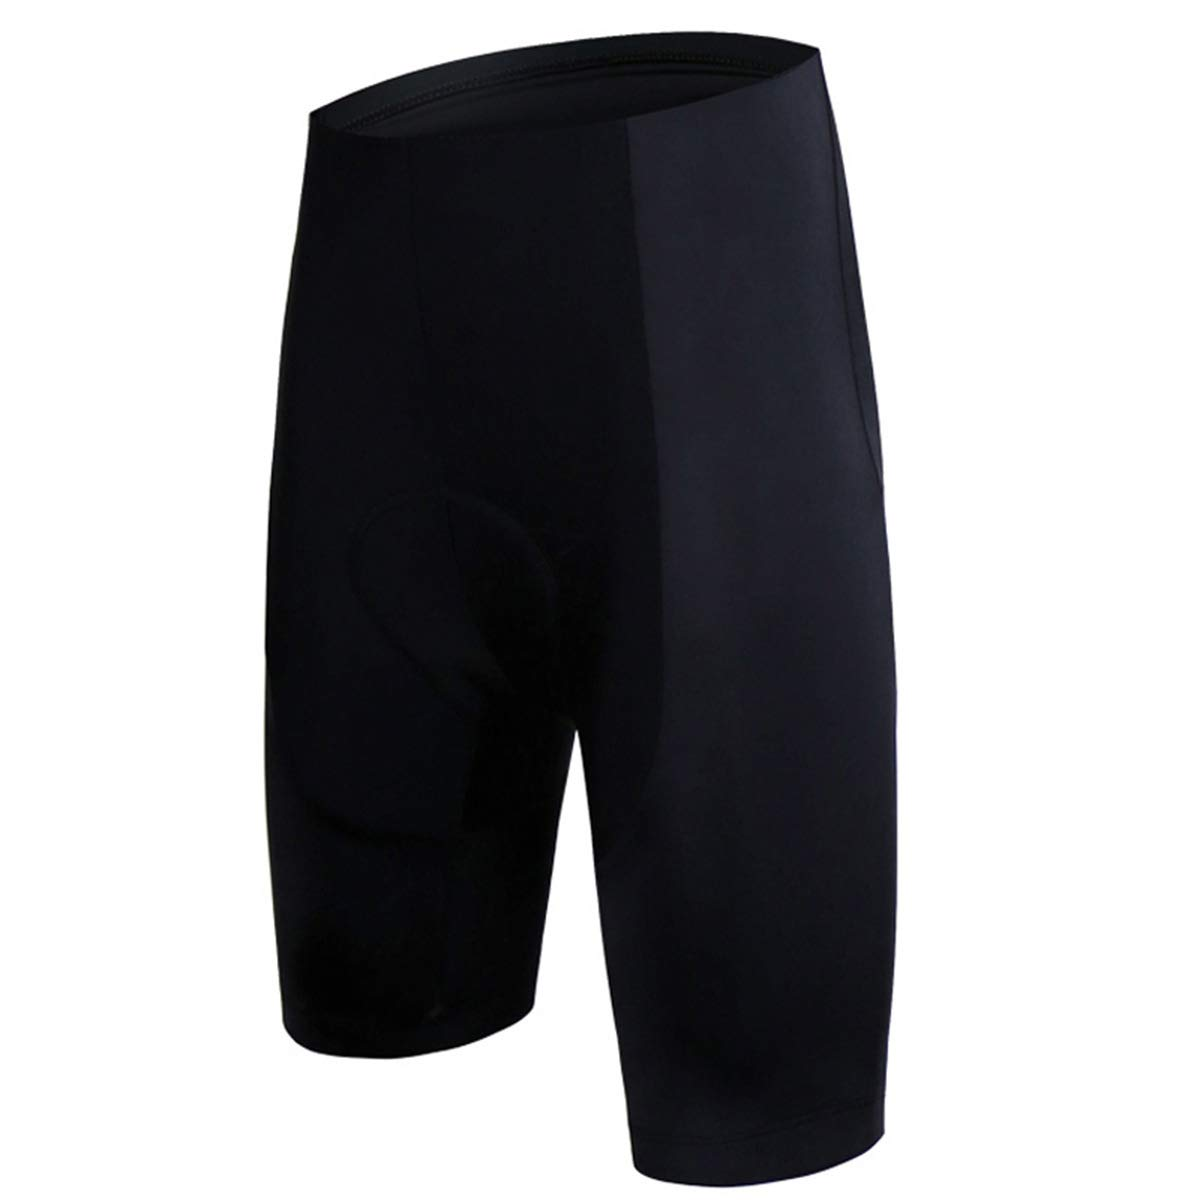 X-TIGER Men's 5D Gel Padded Bike Bicycle MTB Cycling Underwear Shorts